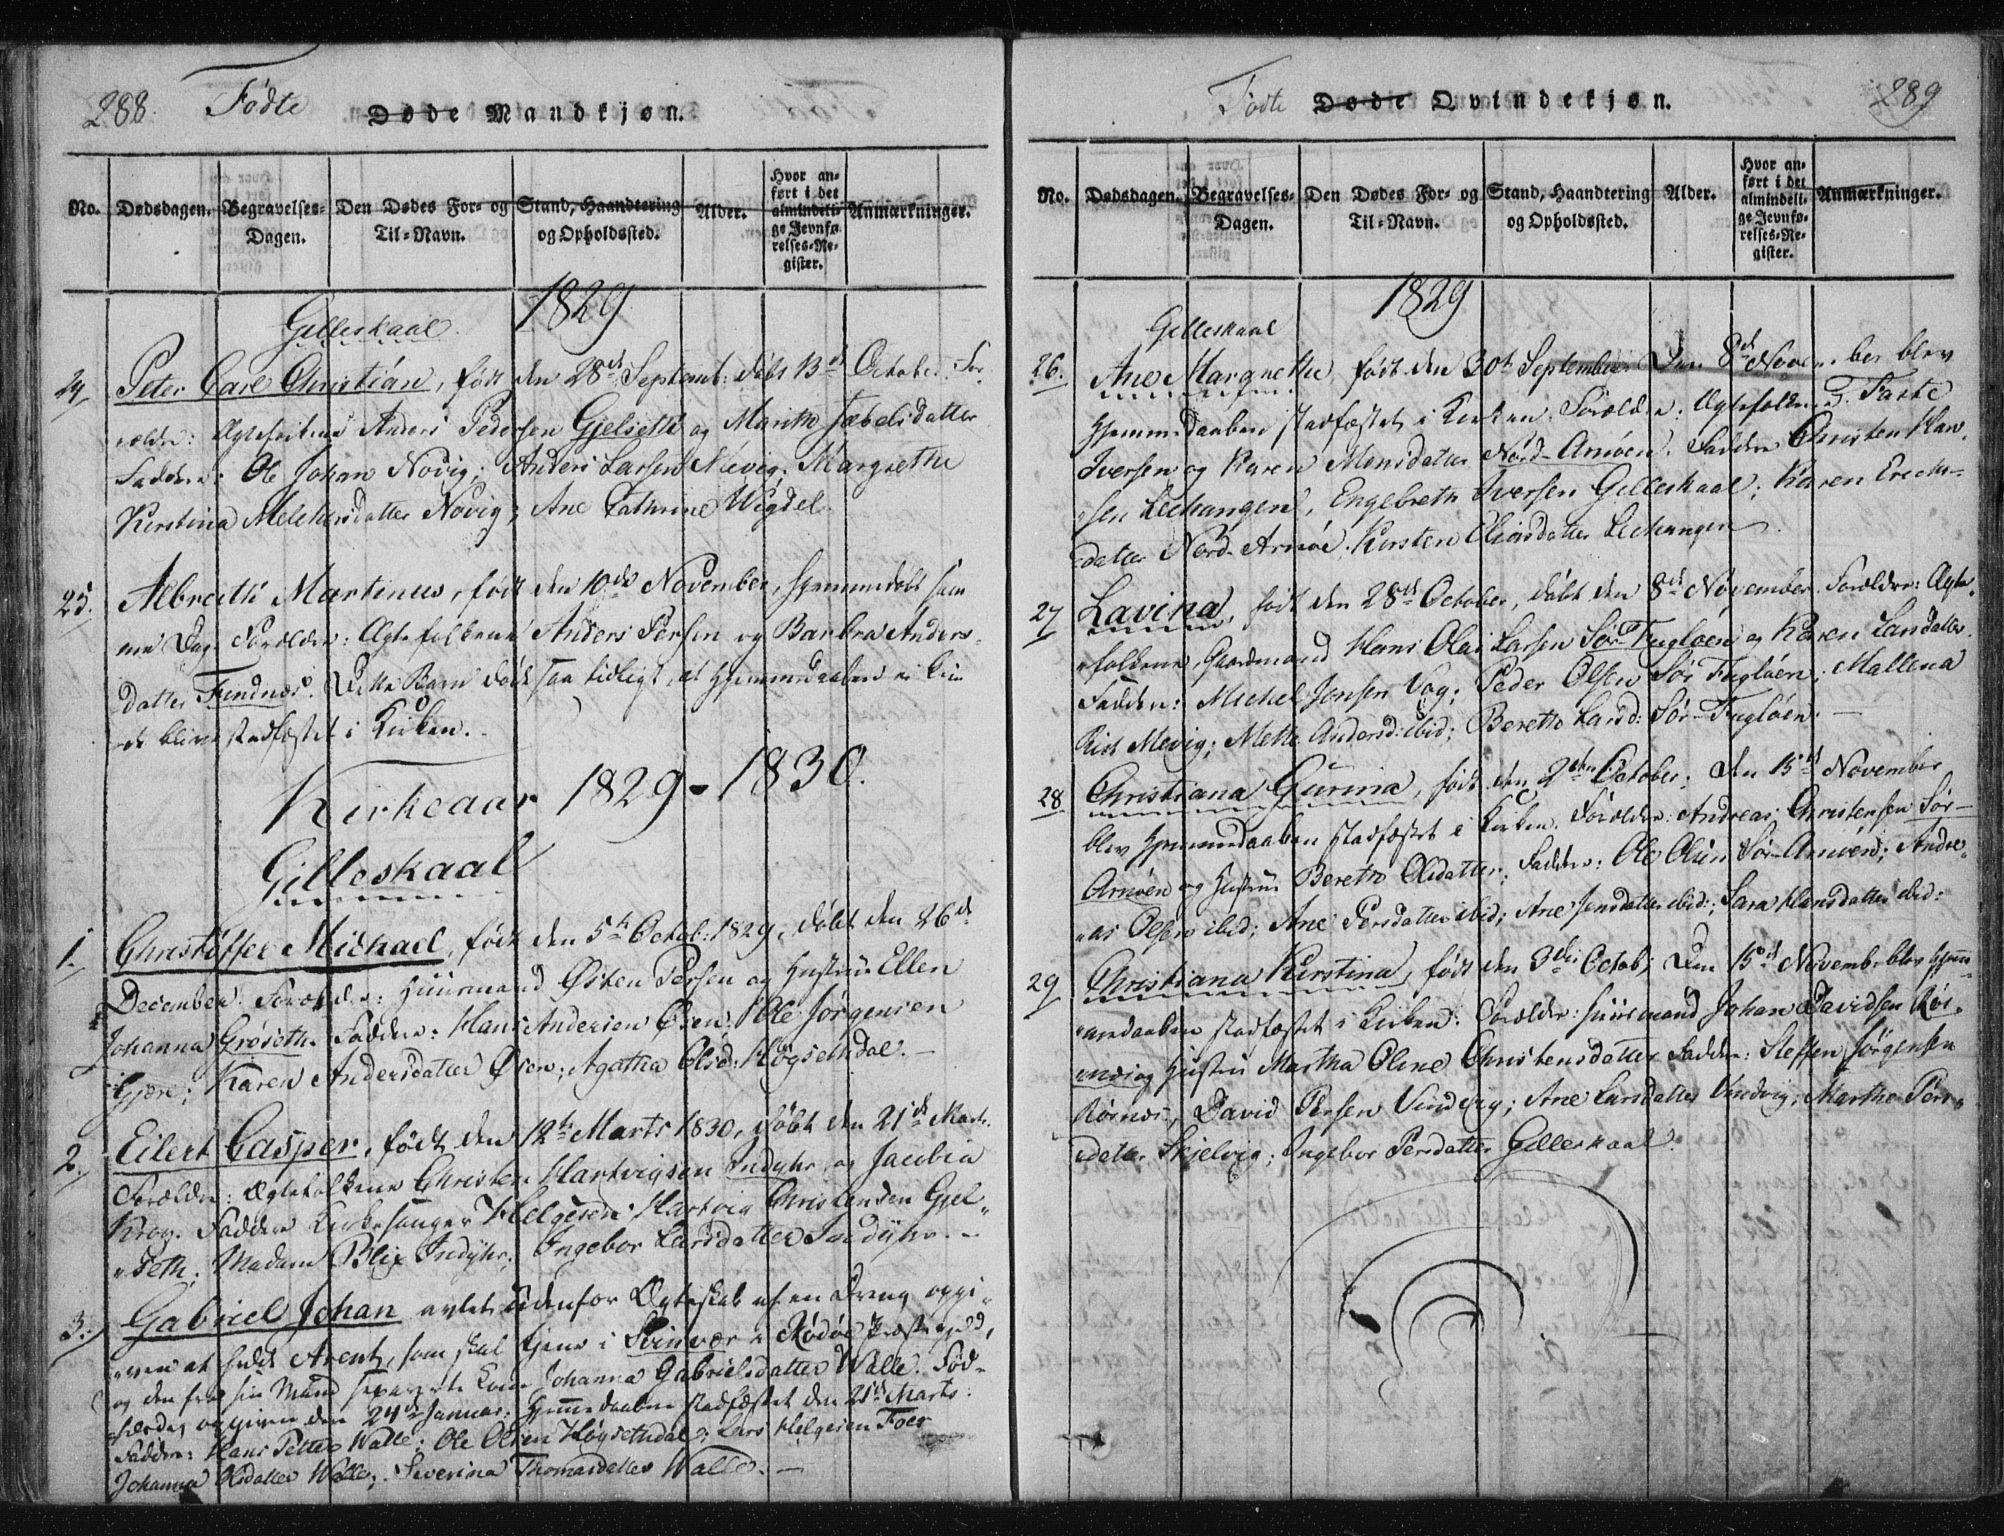 SAT, Ministerialprotokoller, klokkerbøker og fødselsregistre - Nordland, 805/L0096: Ministerialbok nr. 805A03, 1820-1837, s. 288-289